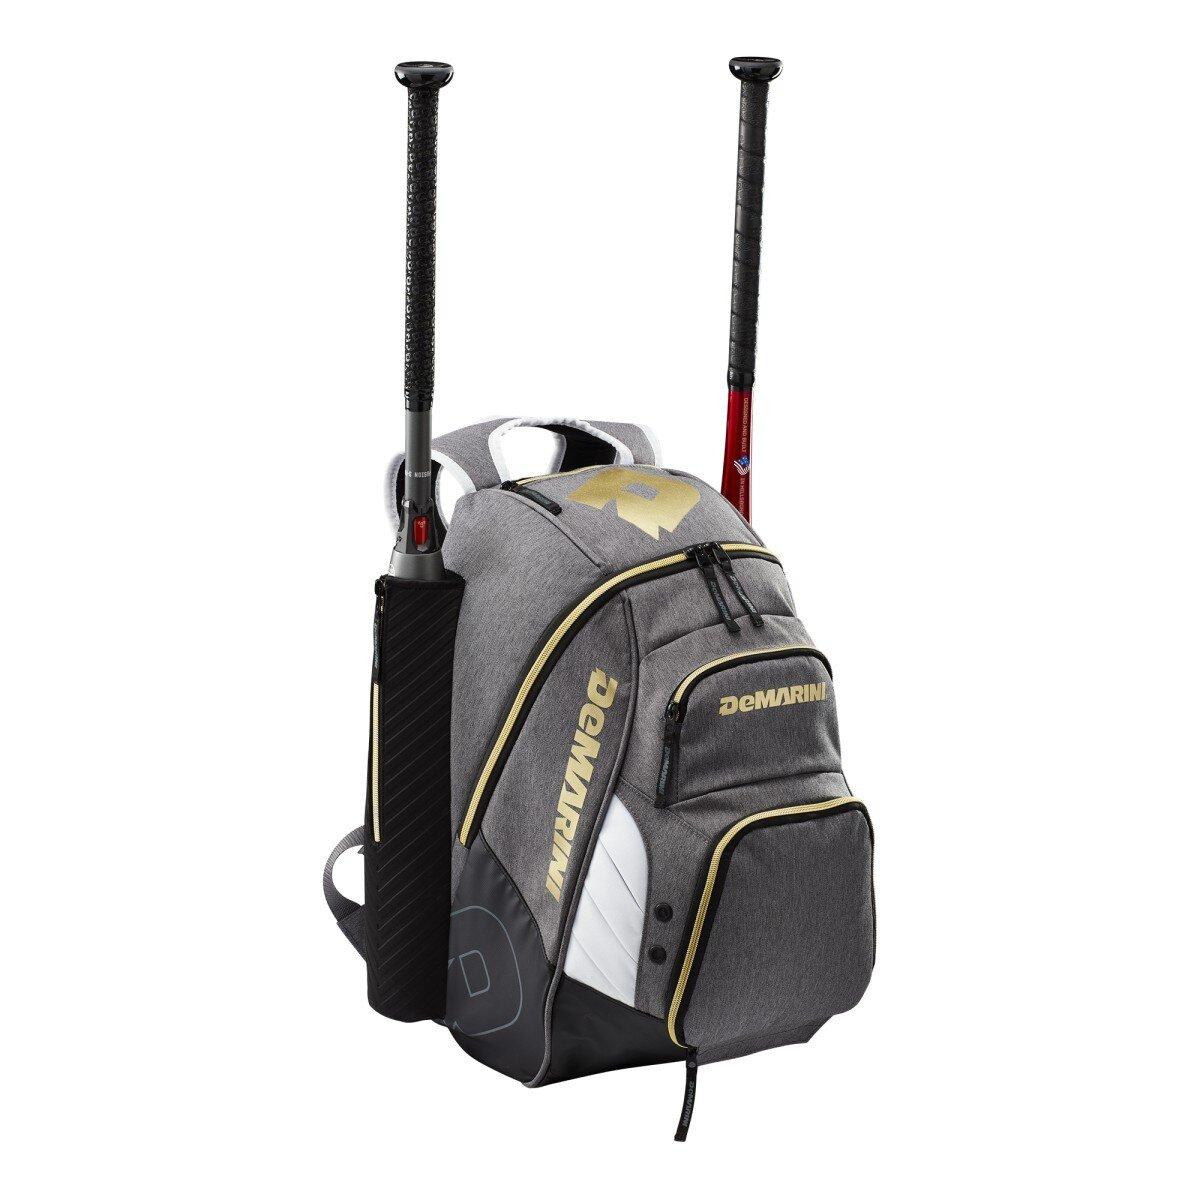 On-Deck-Batting-Cages-Wilson-DeMarini-Discount-Gear-Bag.jpg